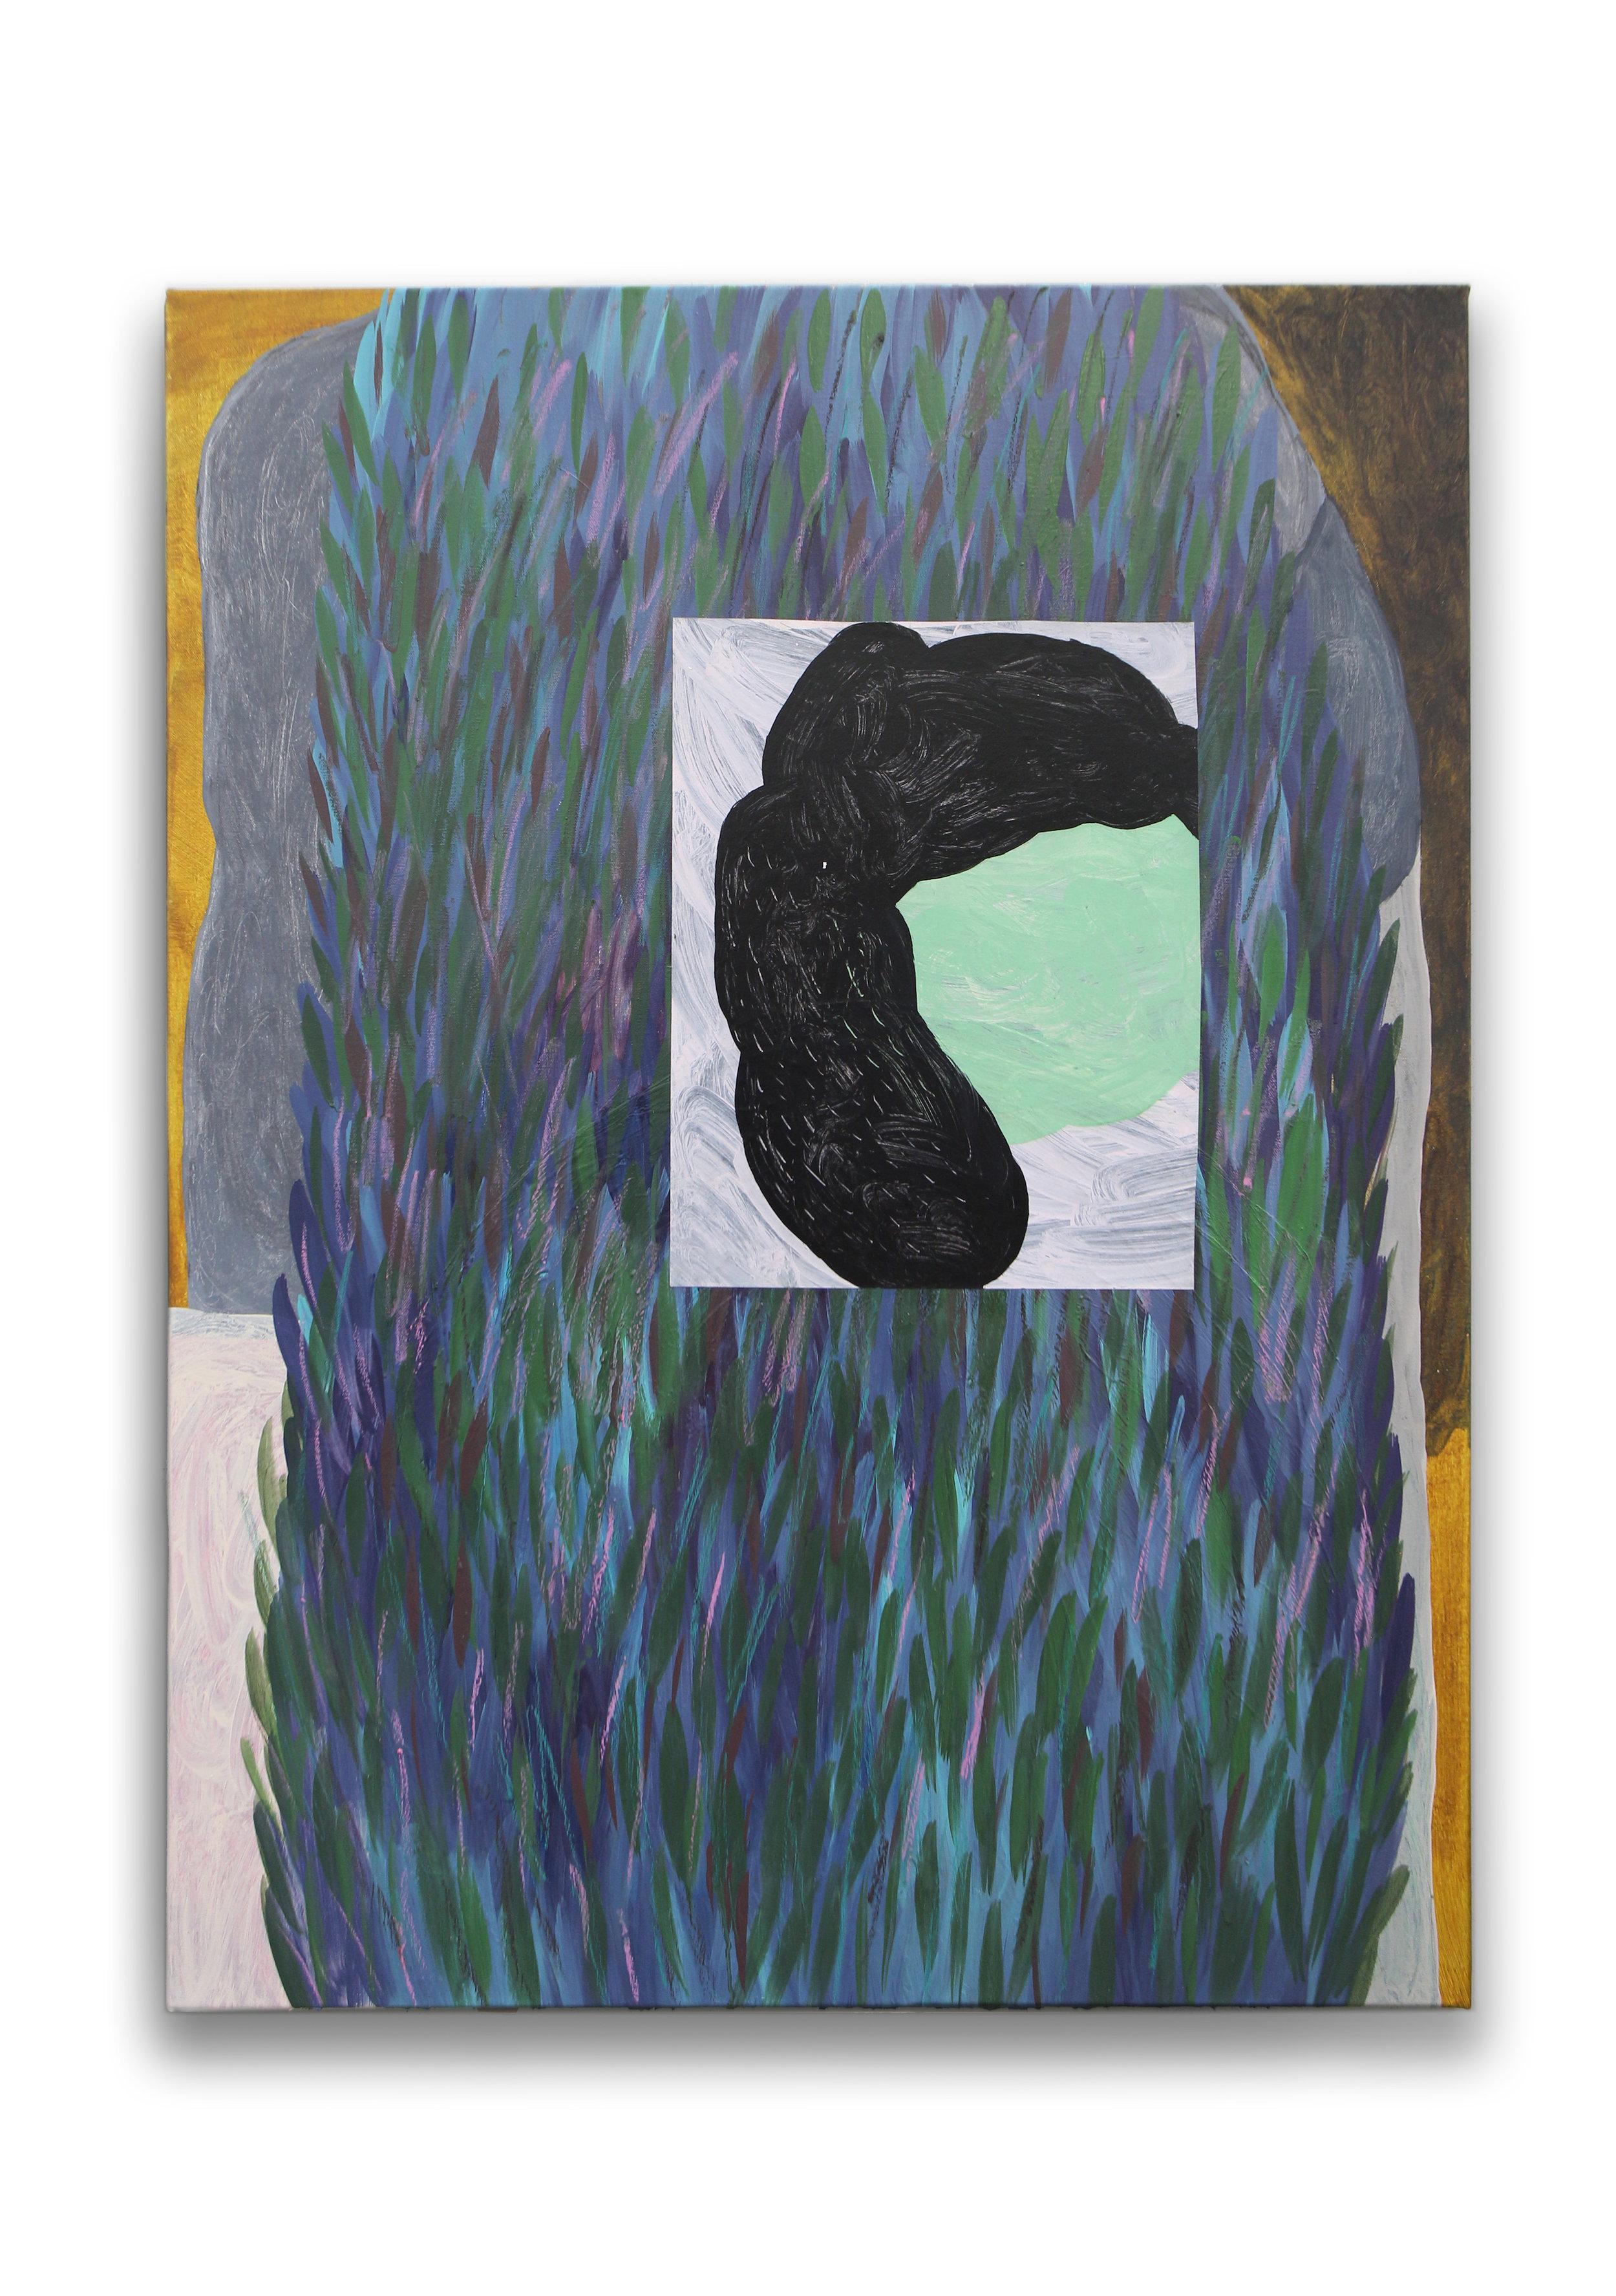 'Vertigo', oil, acrylic and paper on canvas, 101 x 76 cm, 2017.